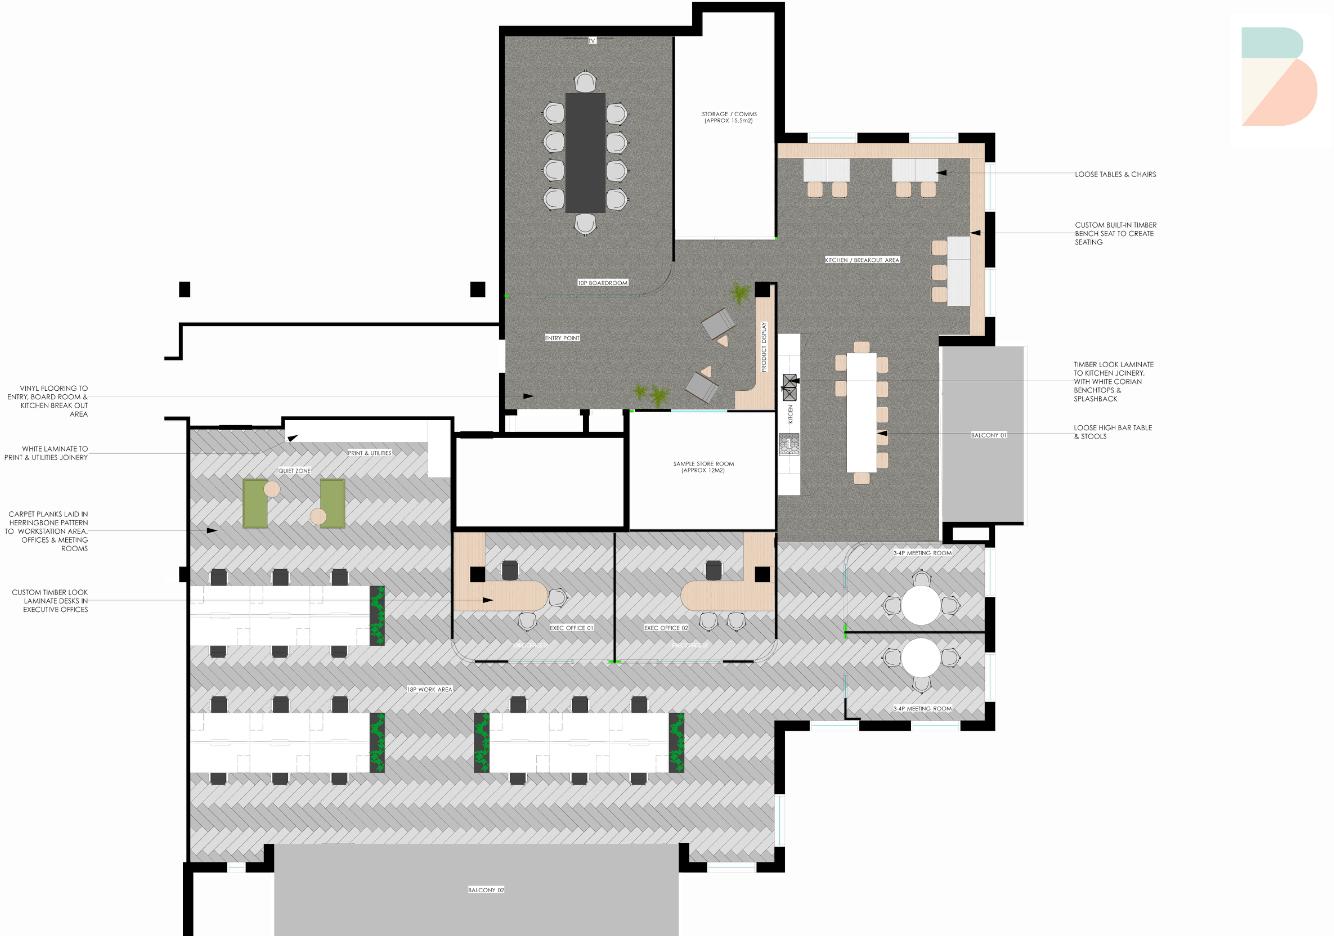 Office interior design Plan Concept.png